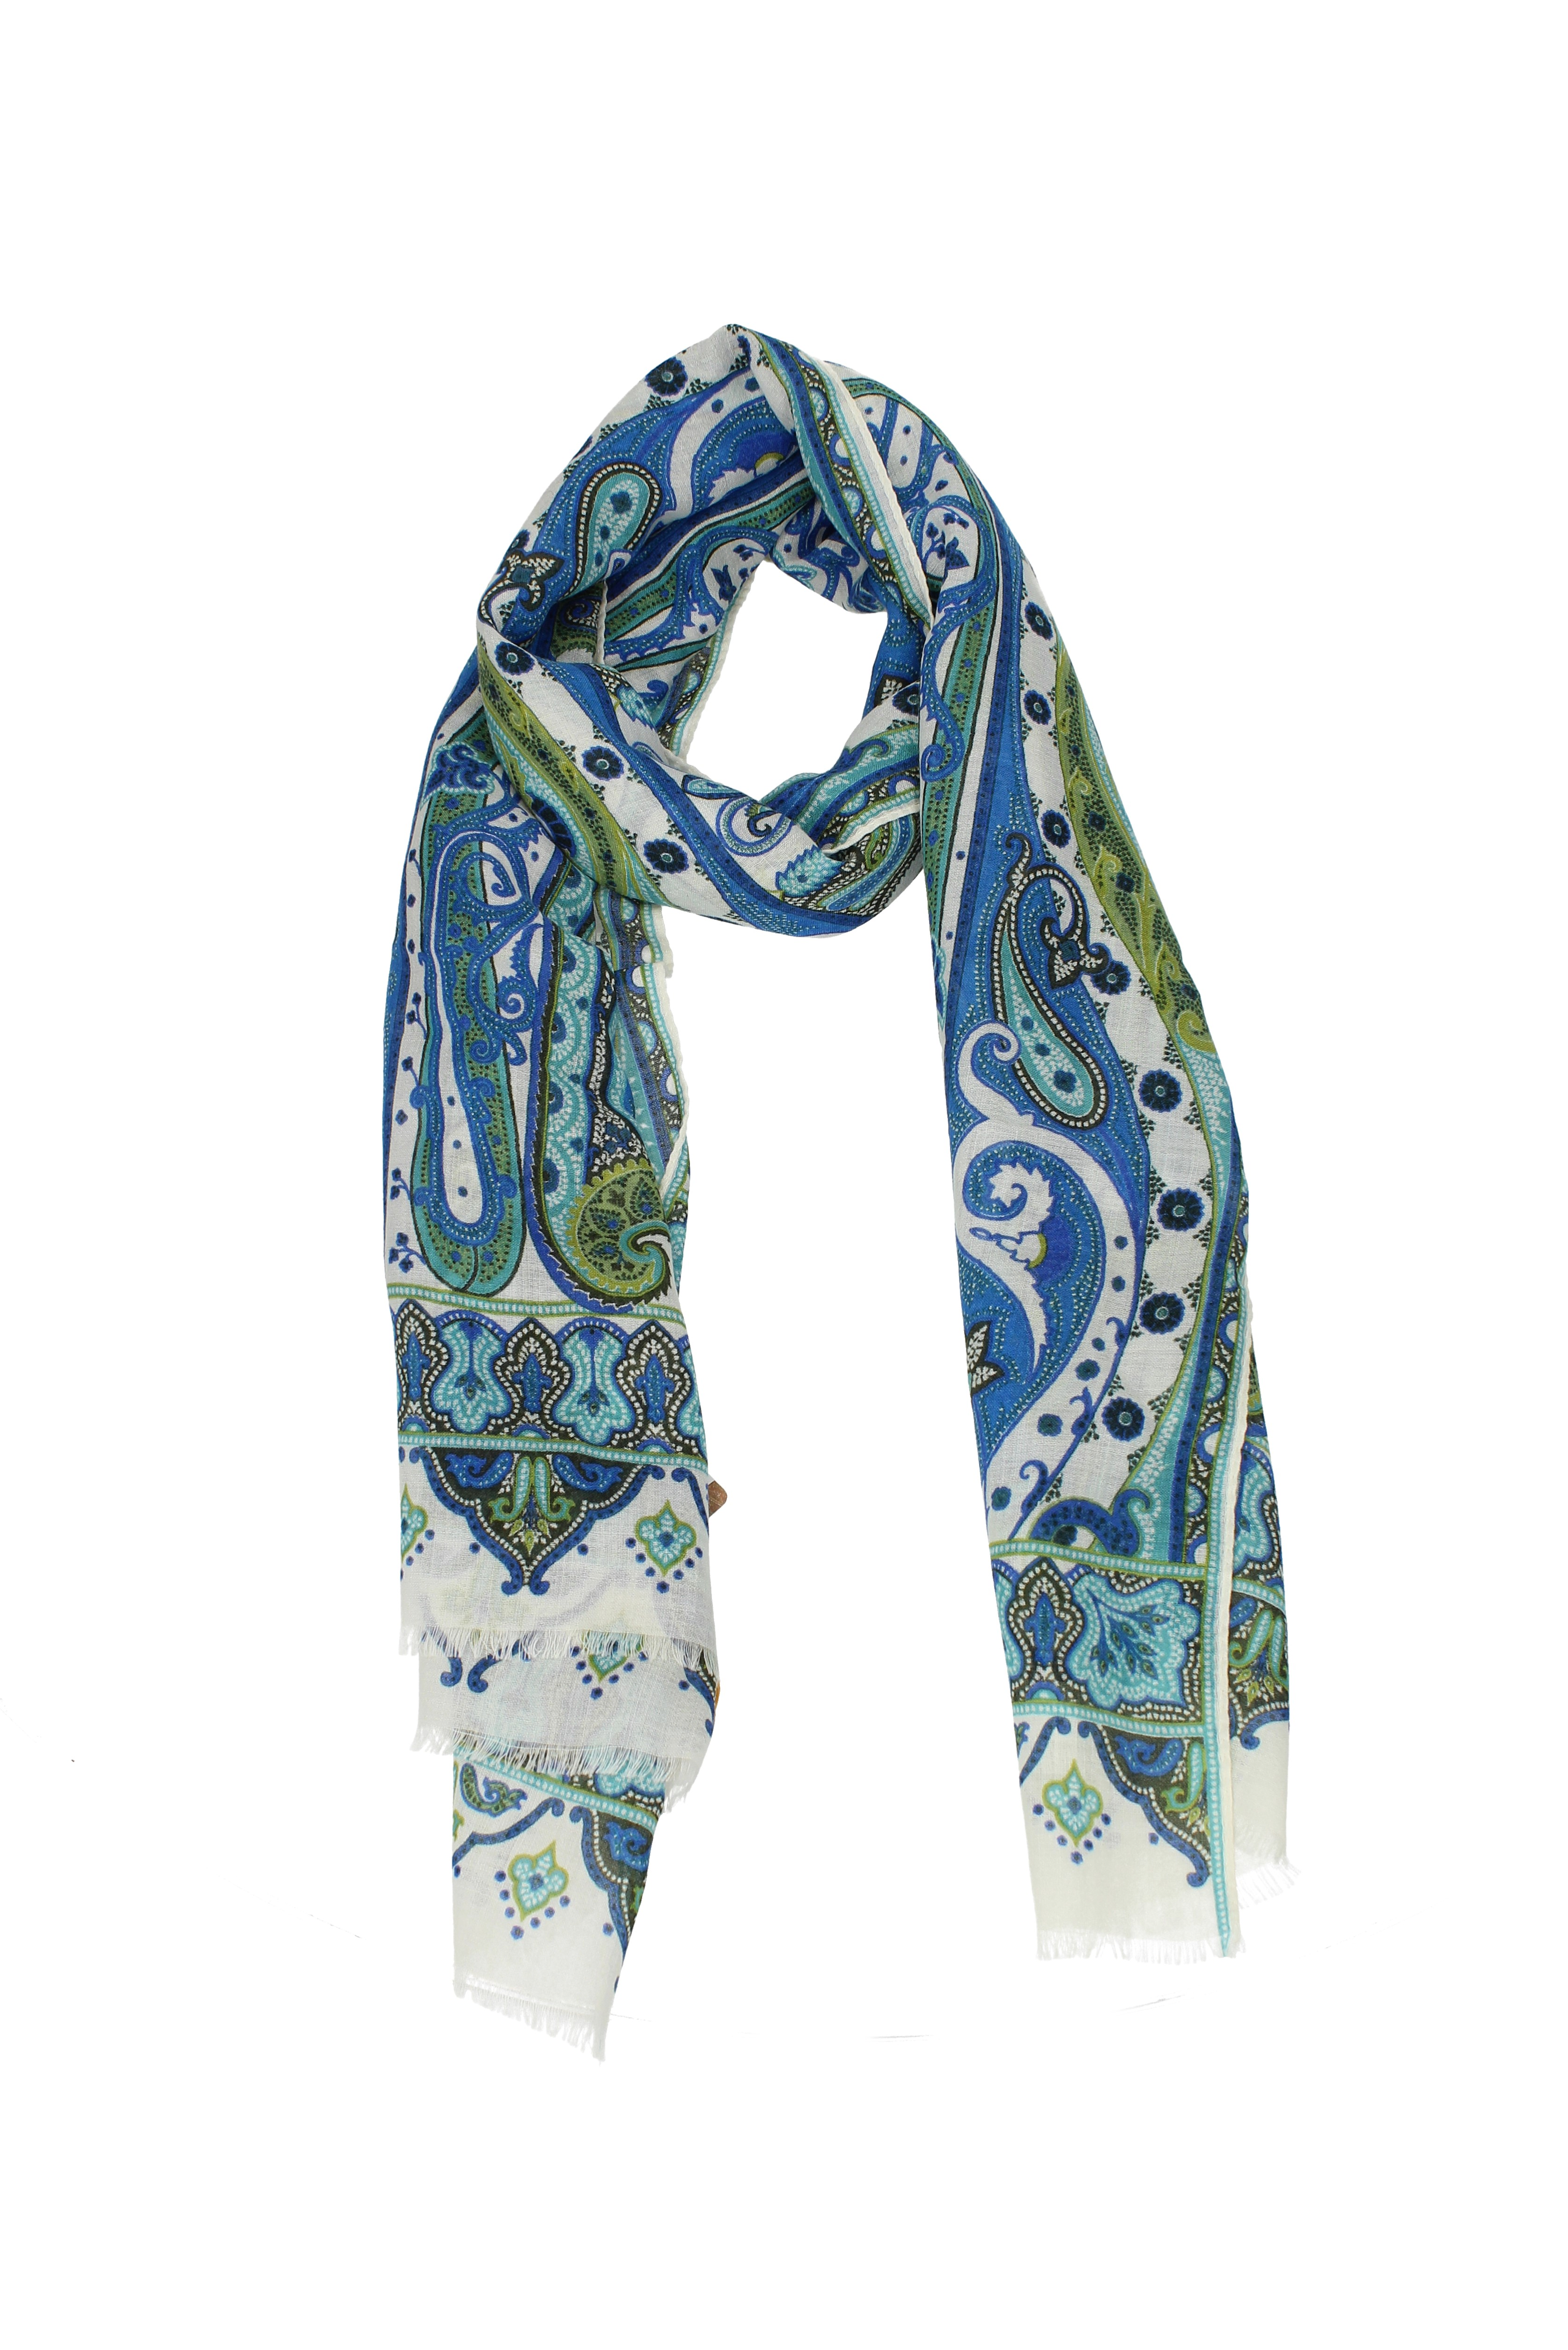 online store c90da a2190 Details about Foulard Etro Men - Silk (100074224)